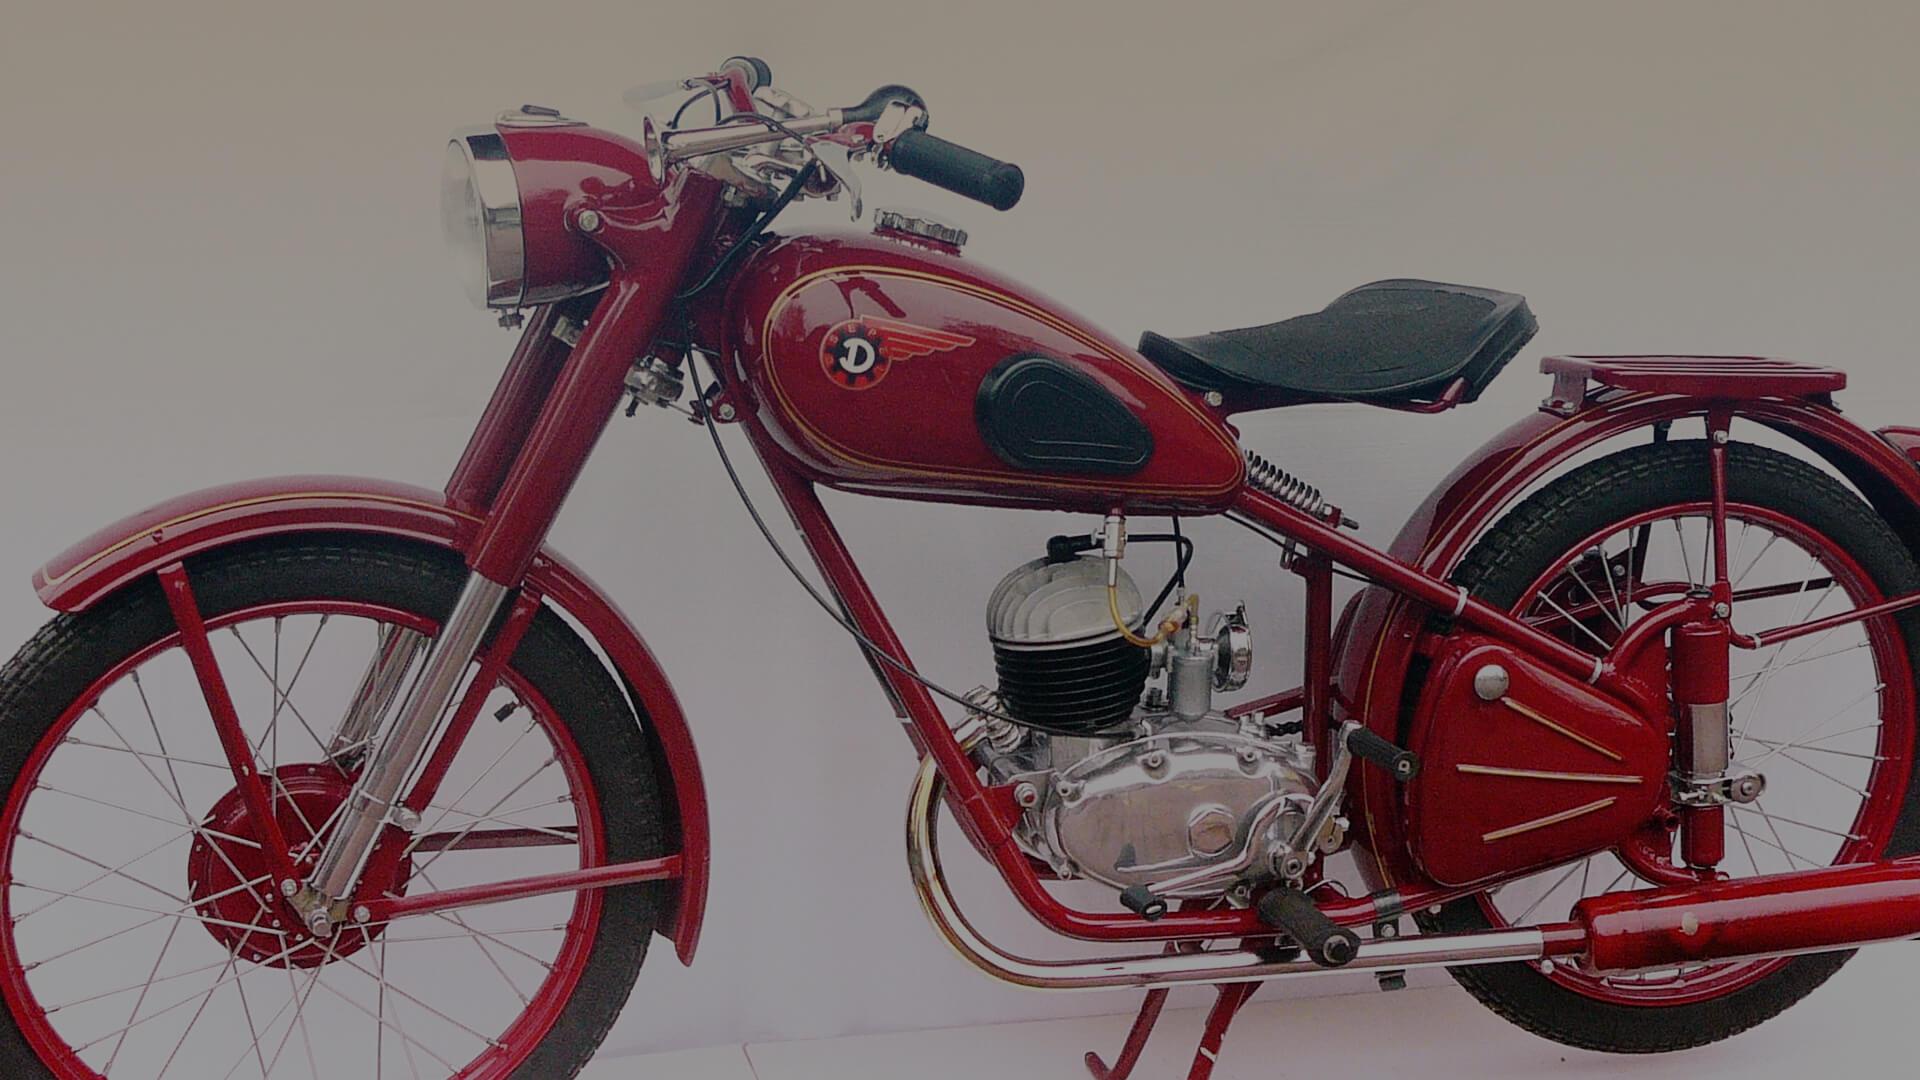 CSEPEL 125/D, 123 cm³, 1955